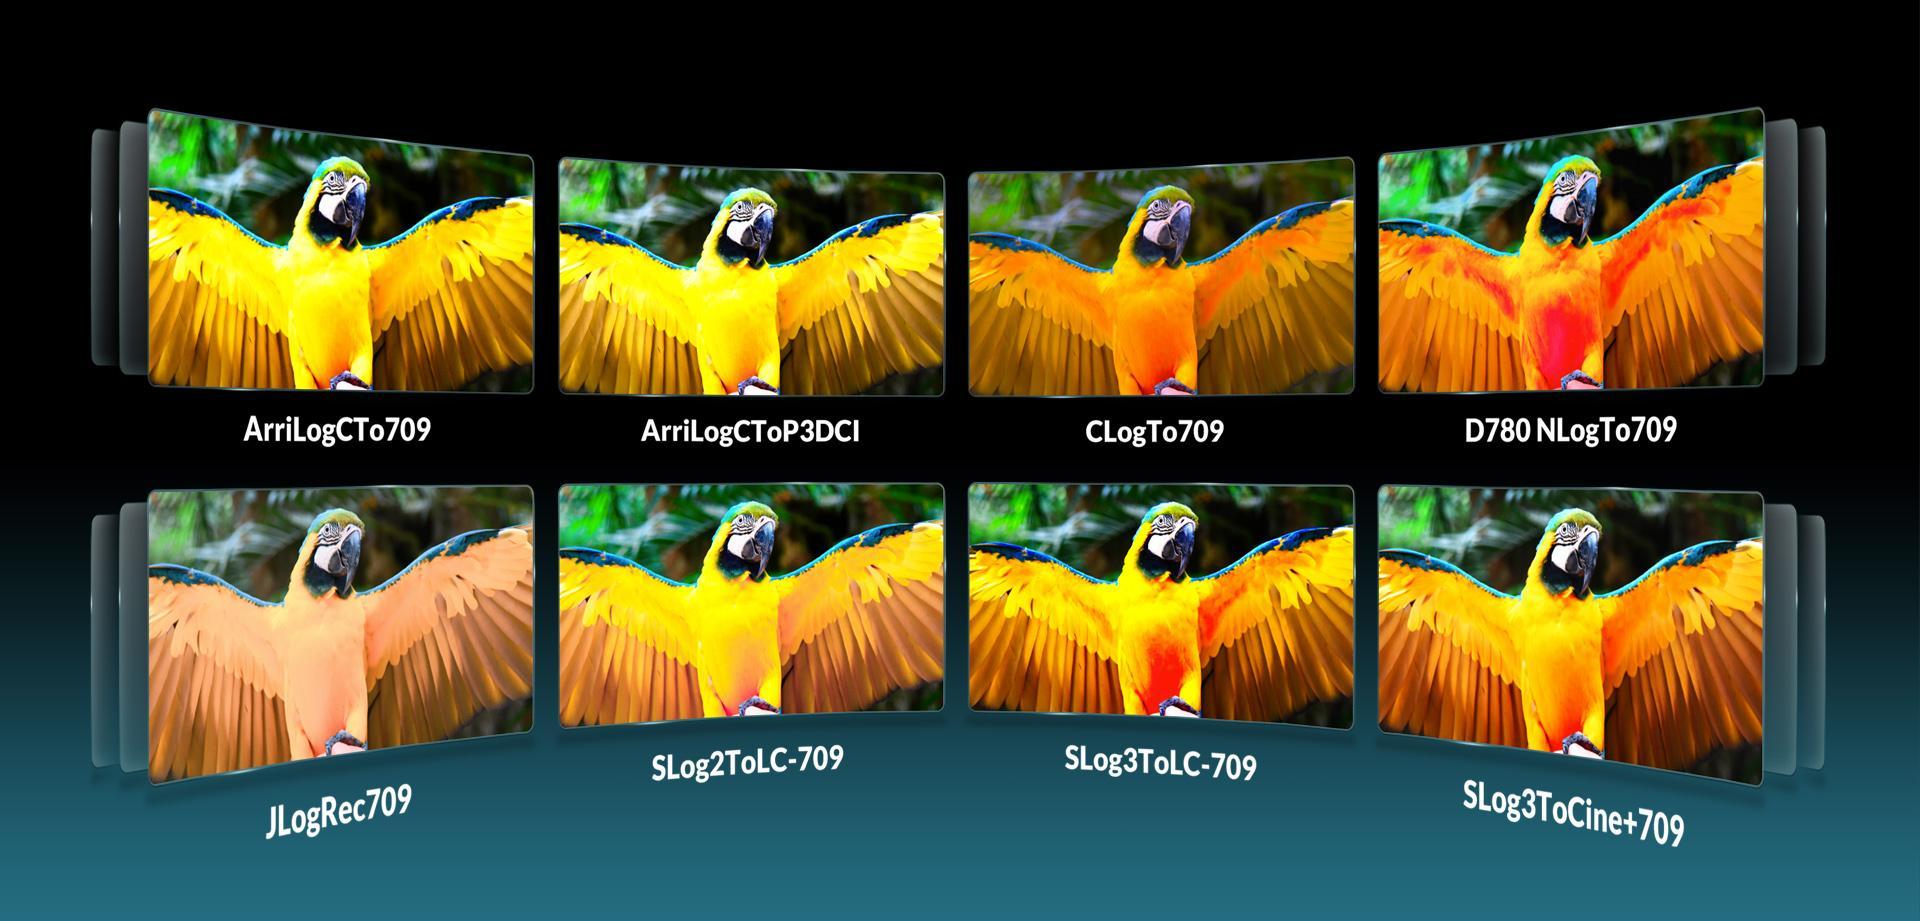 LILLIPUT 23.8inch UHD 12G-SDI,HDMI 2.0 broadcast  production studio monitor 12